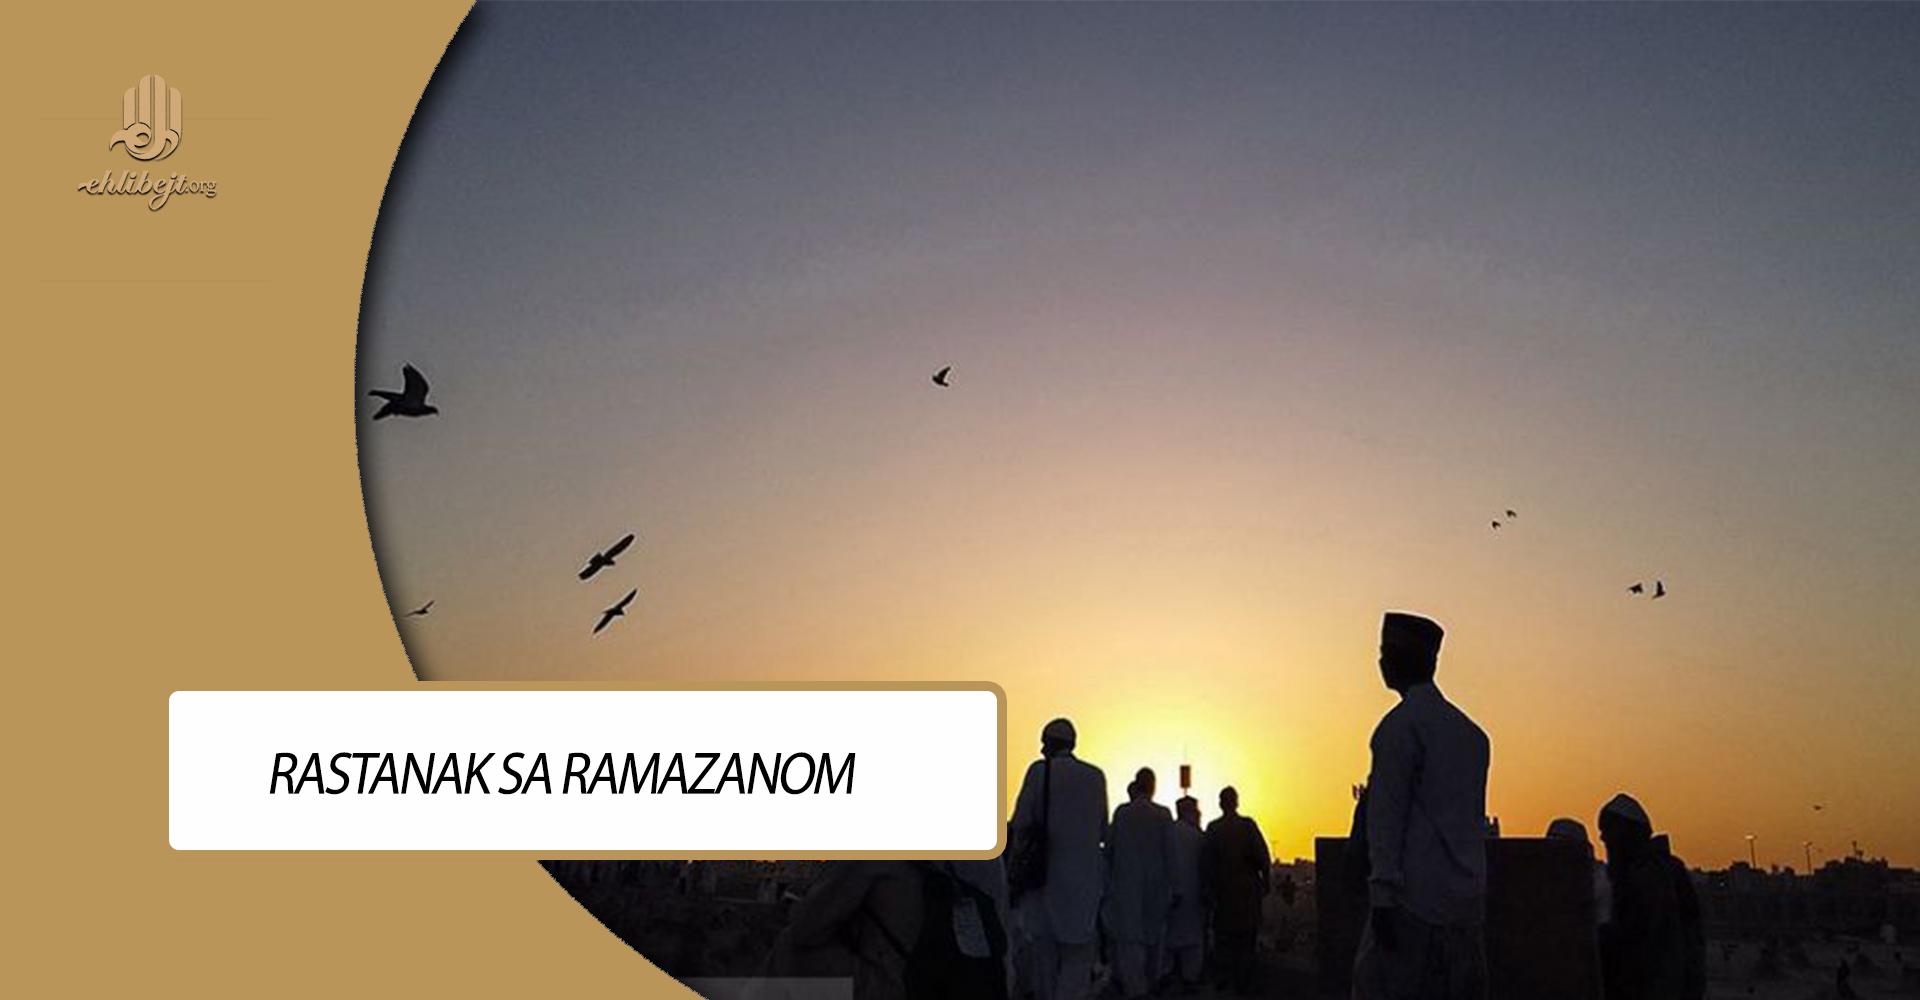 Rastanak sa ramazanom